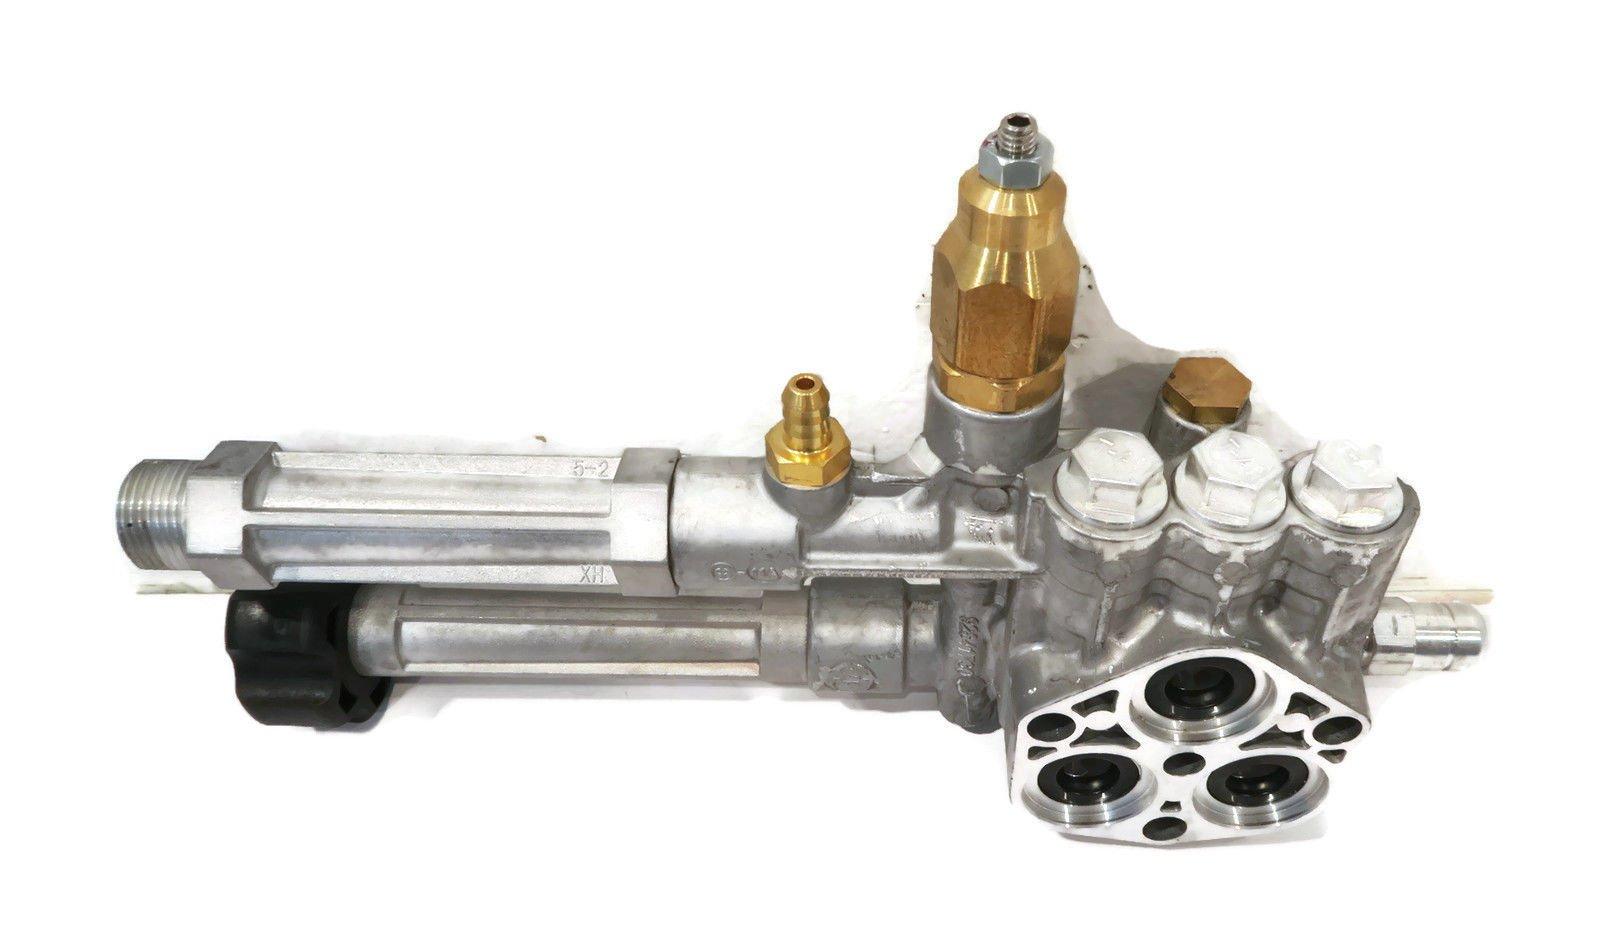 New 2700 PSI PRESSURE WASHER WATER PUMP fits Generac 580.752000 580.767101